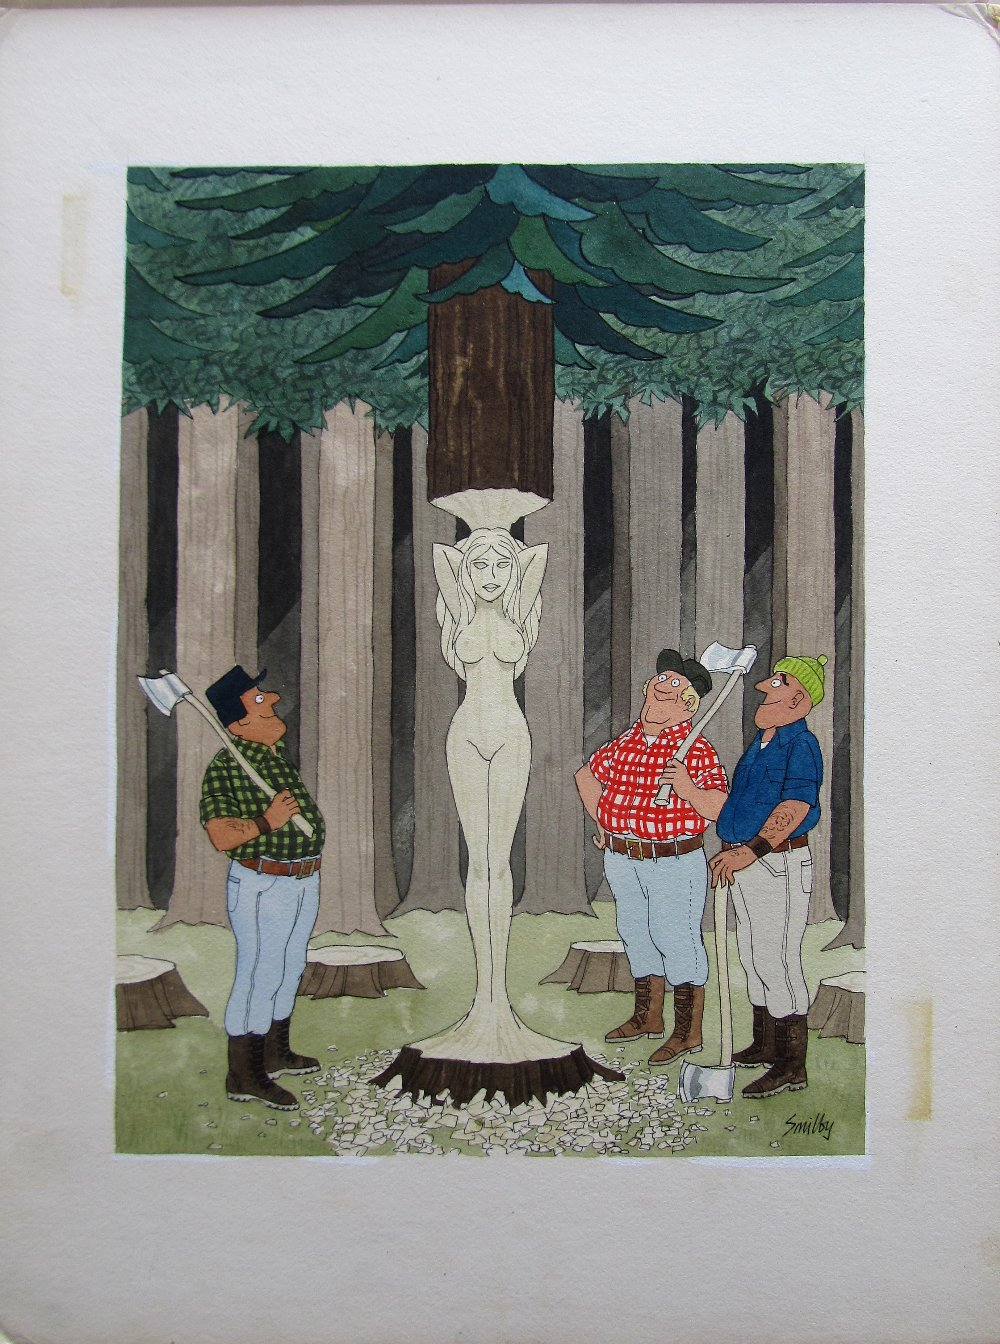 Lot 10 - Smilby, Francis Wilford-Smith 'Tree carvers' uncaptioned cartoon artwork for Pardon Magazin Germany